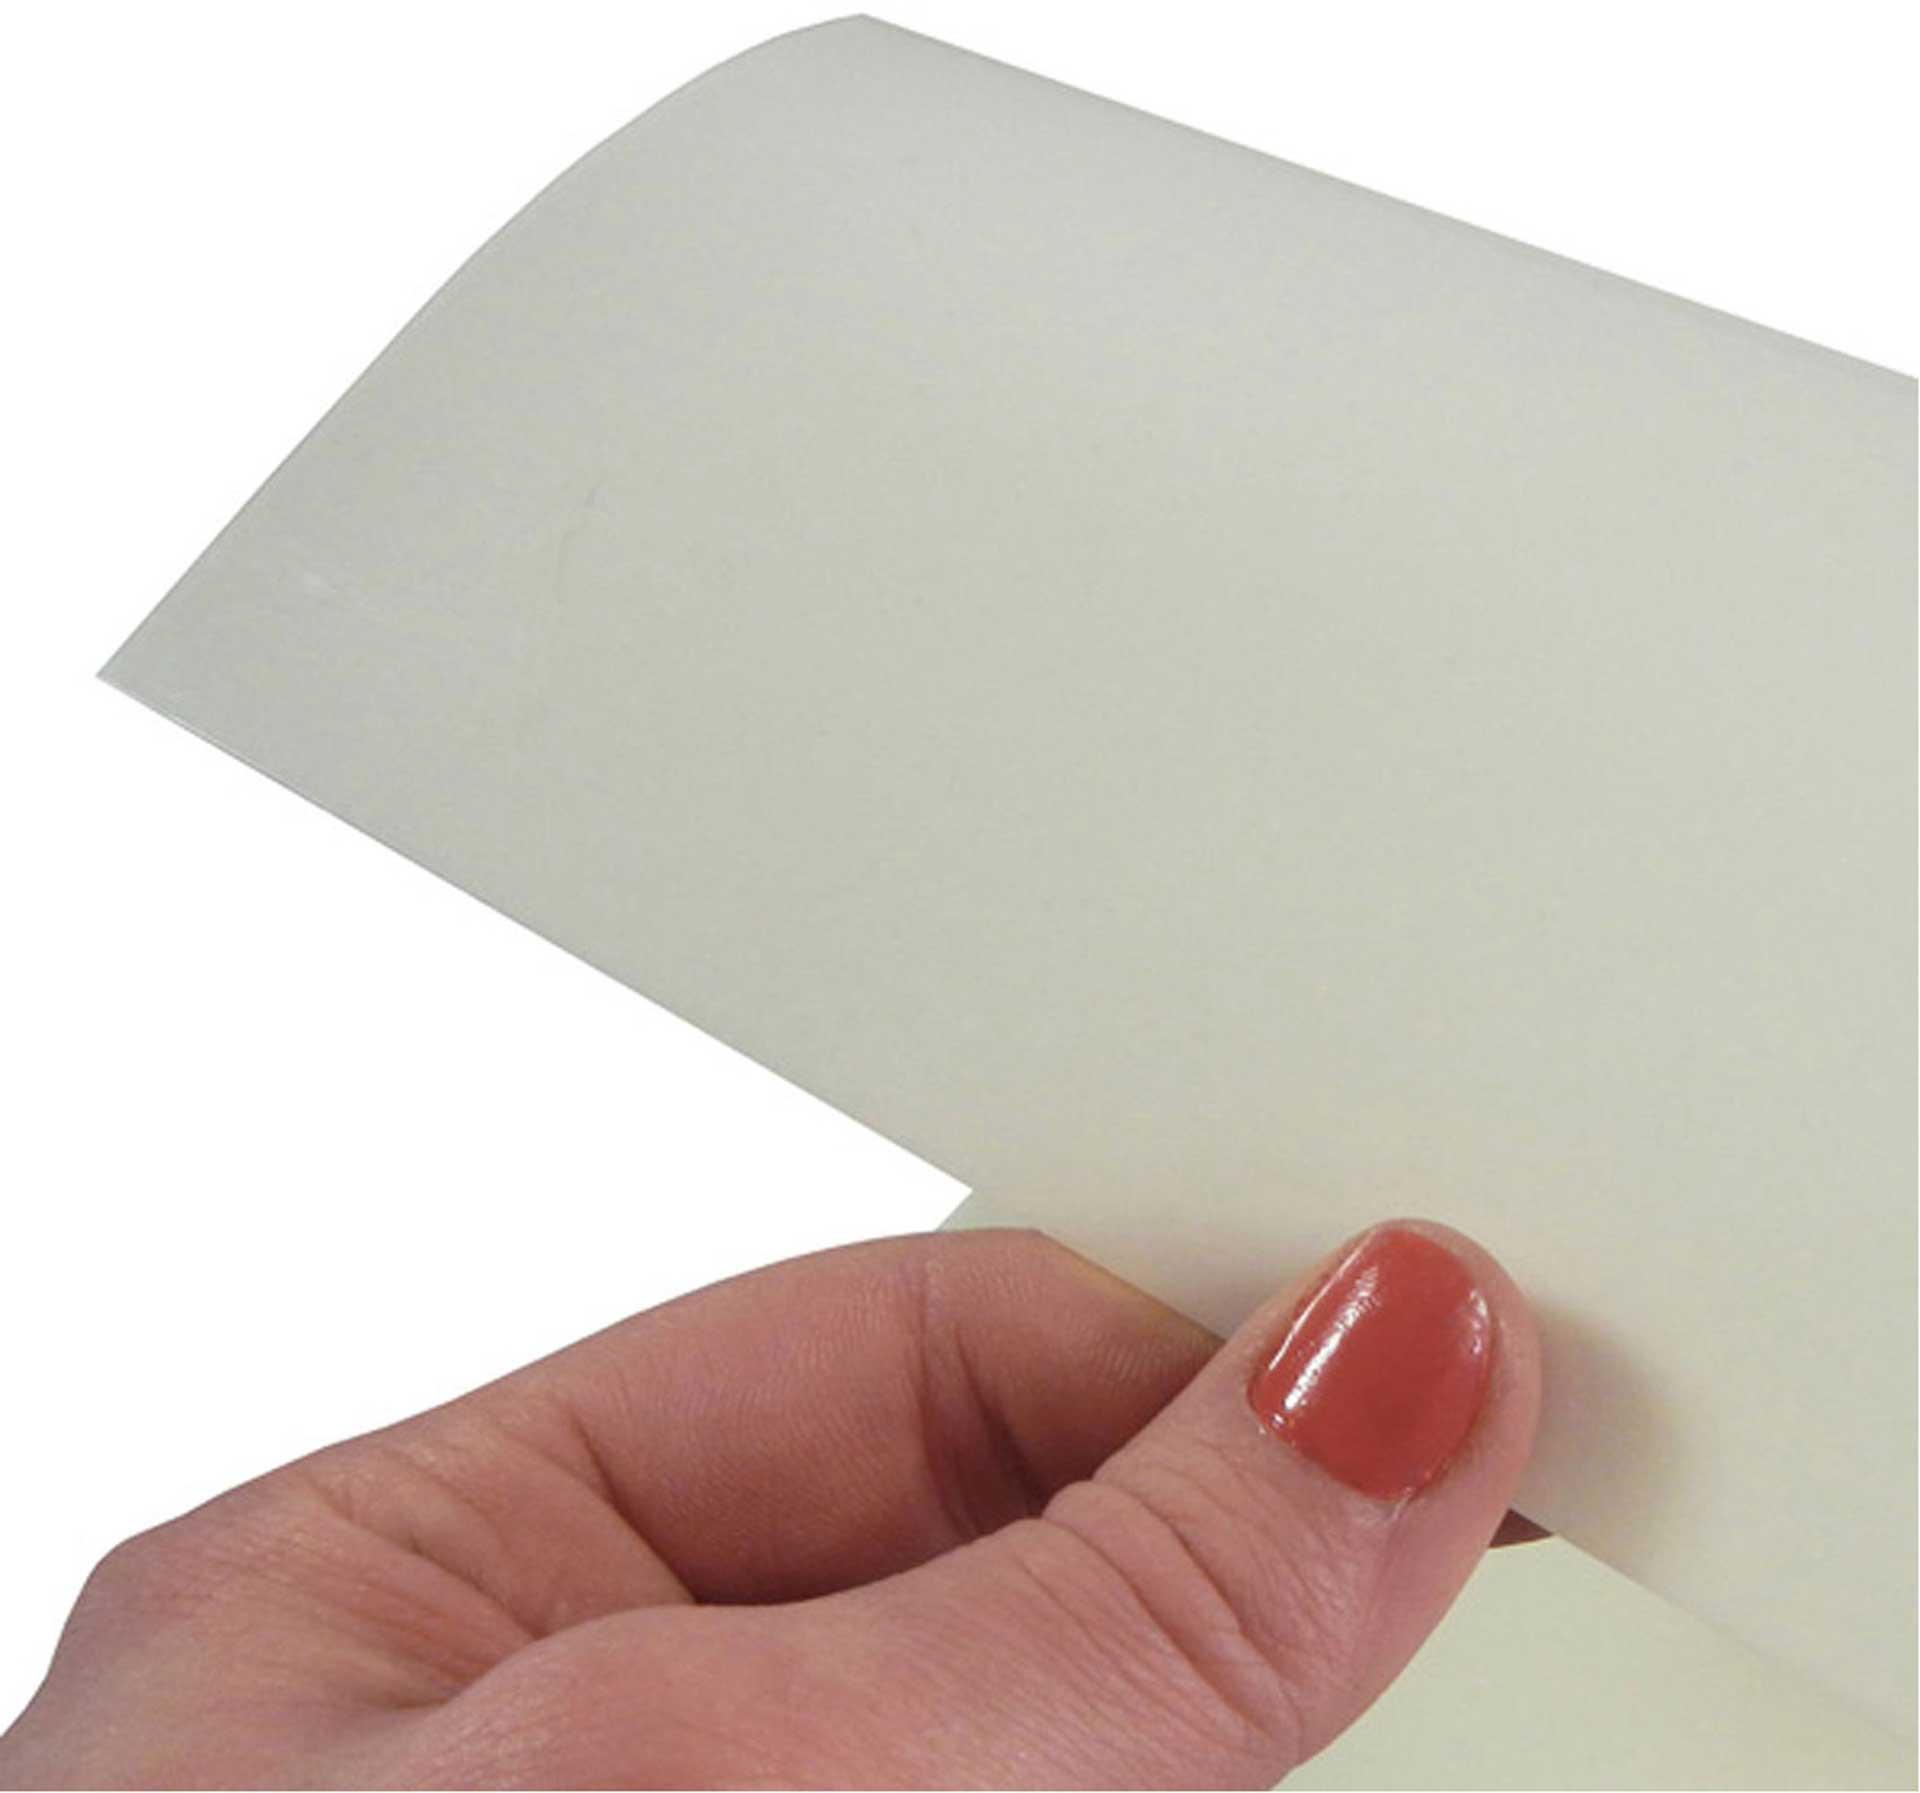 R&G PET-Folie Mylar® A 350 (100 cm) Rolle/ 5 m